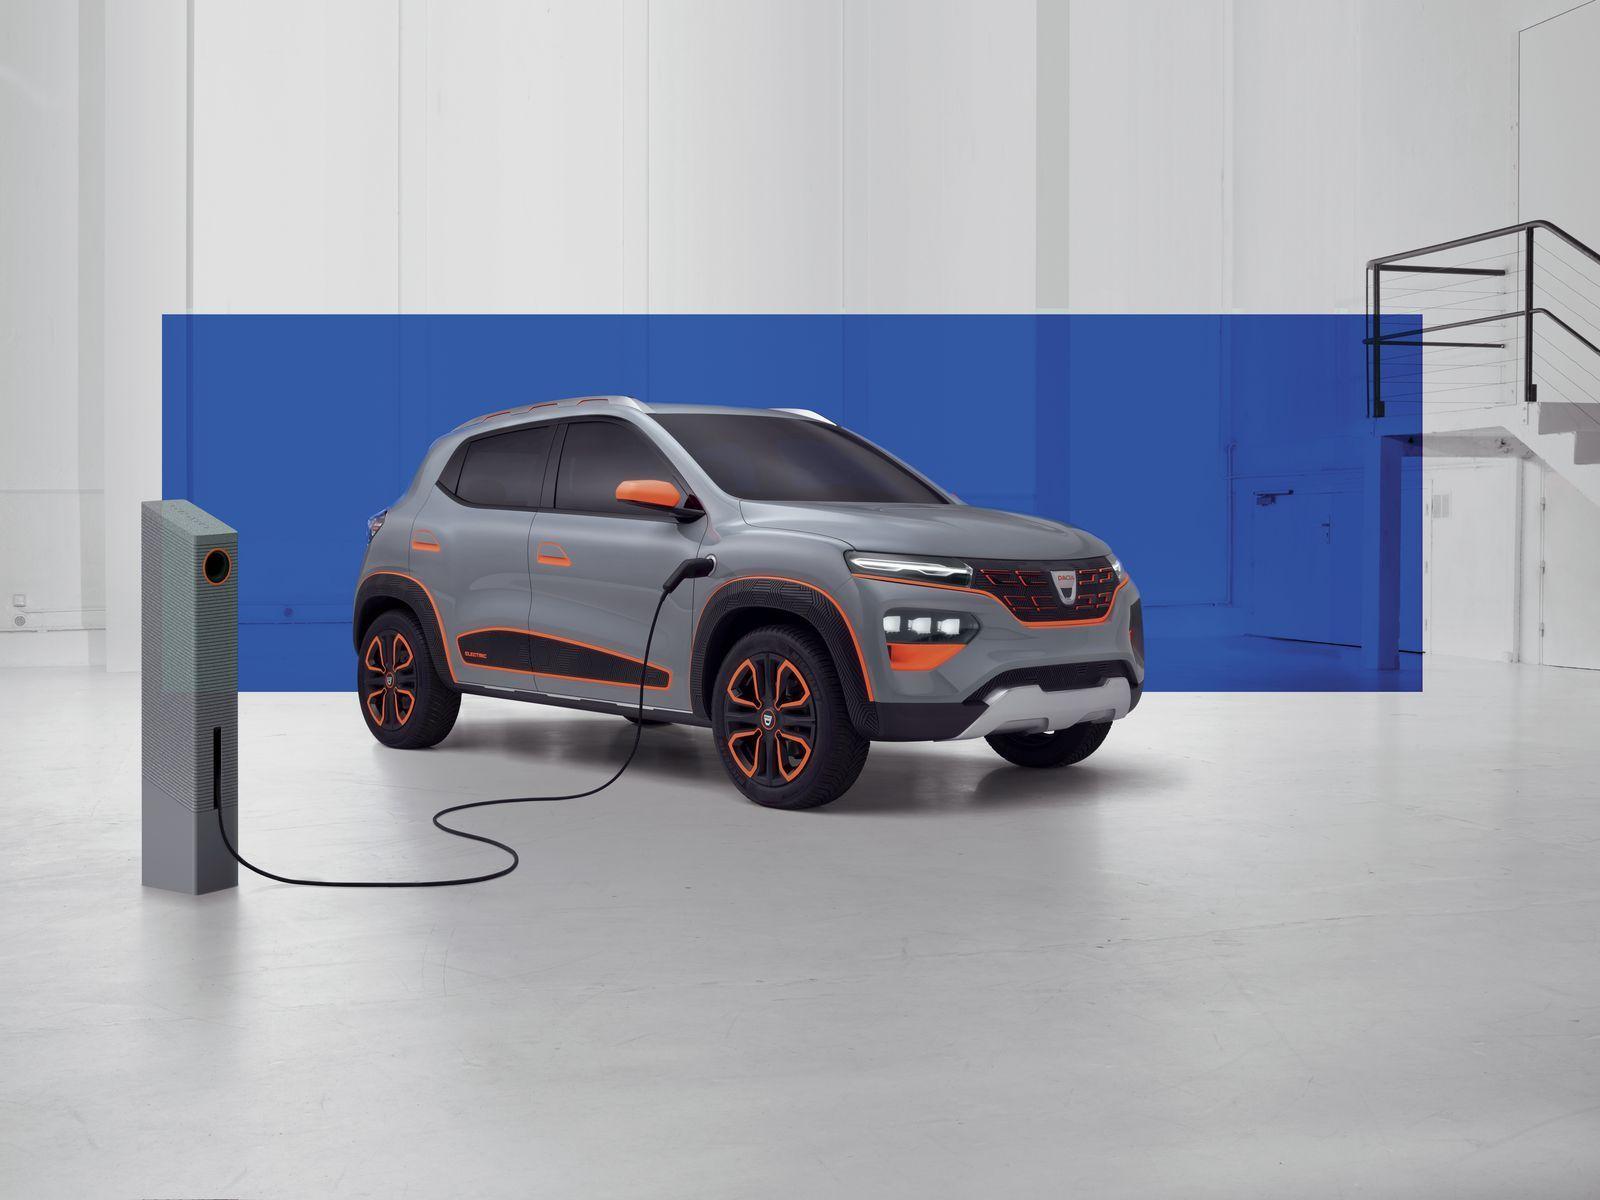 DaciaSpring_Concept_AutoRok_2020_01